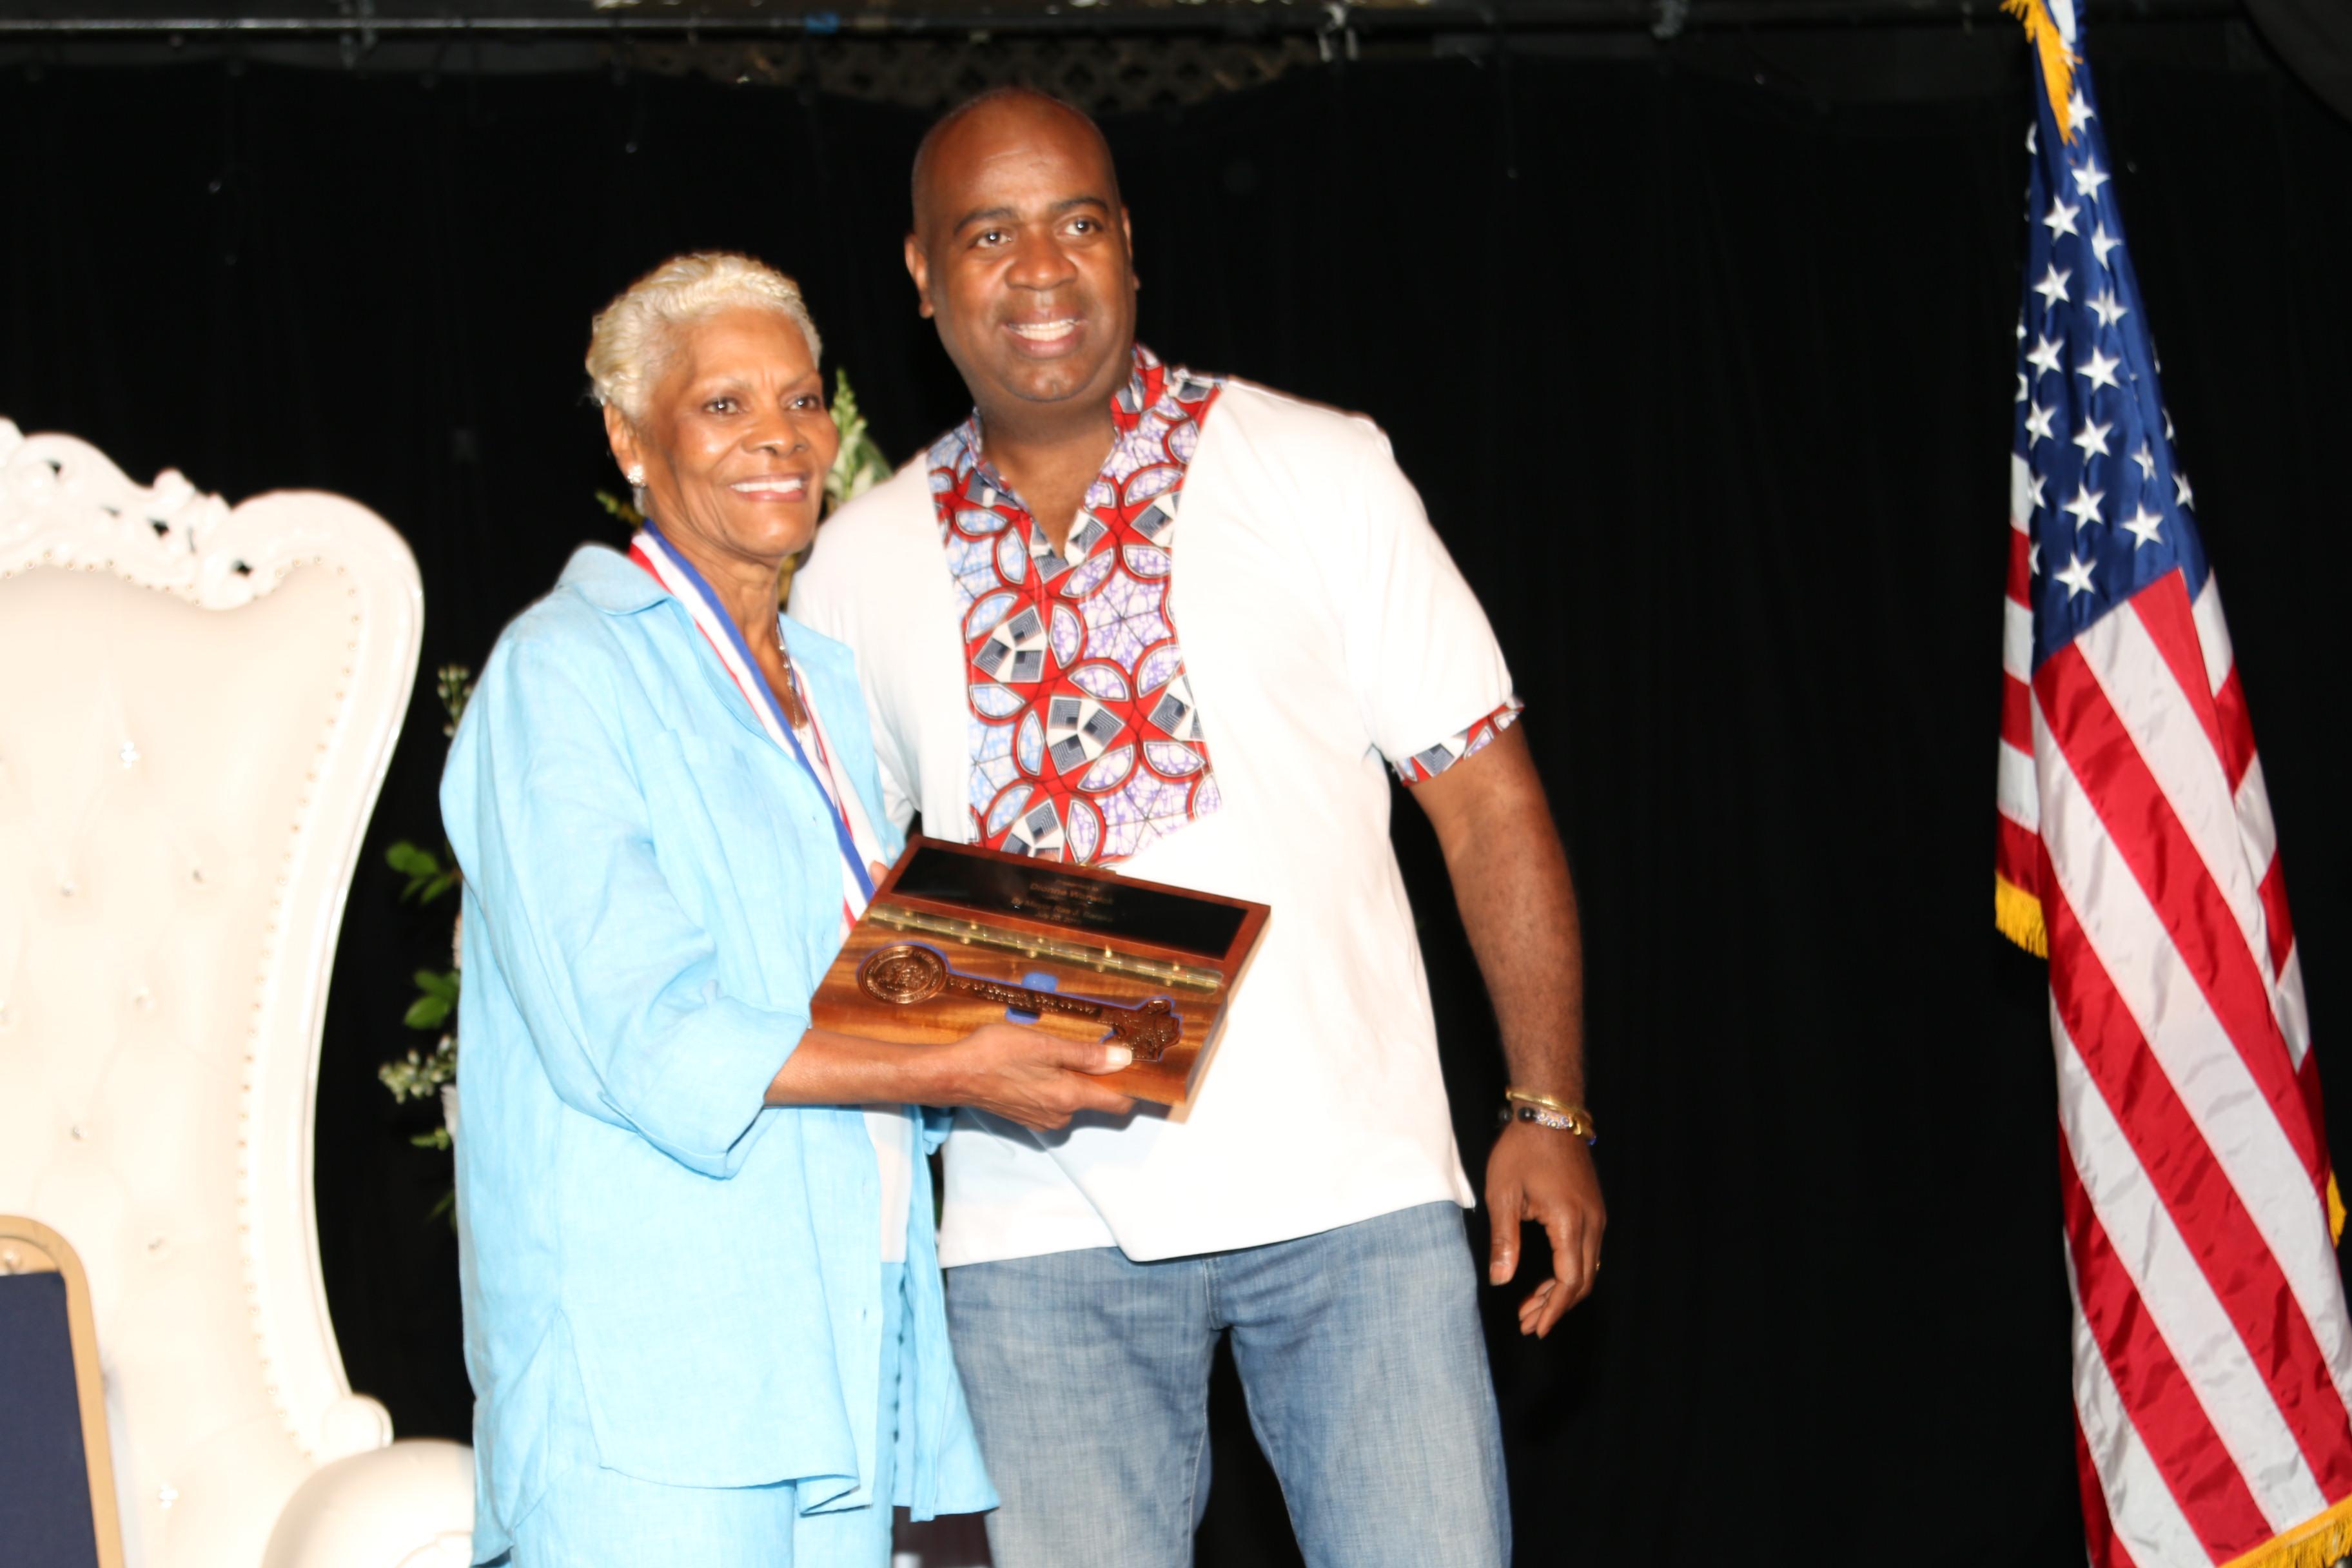 Music legend Dionne Warwick got her start in N.J. city. We just celebrated it.